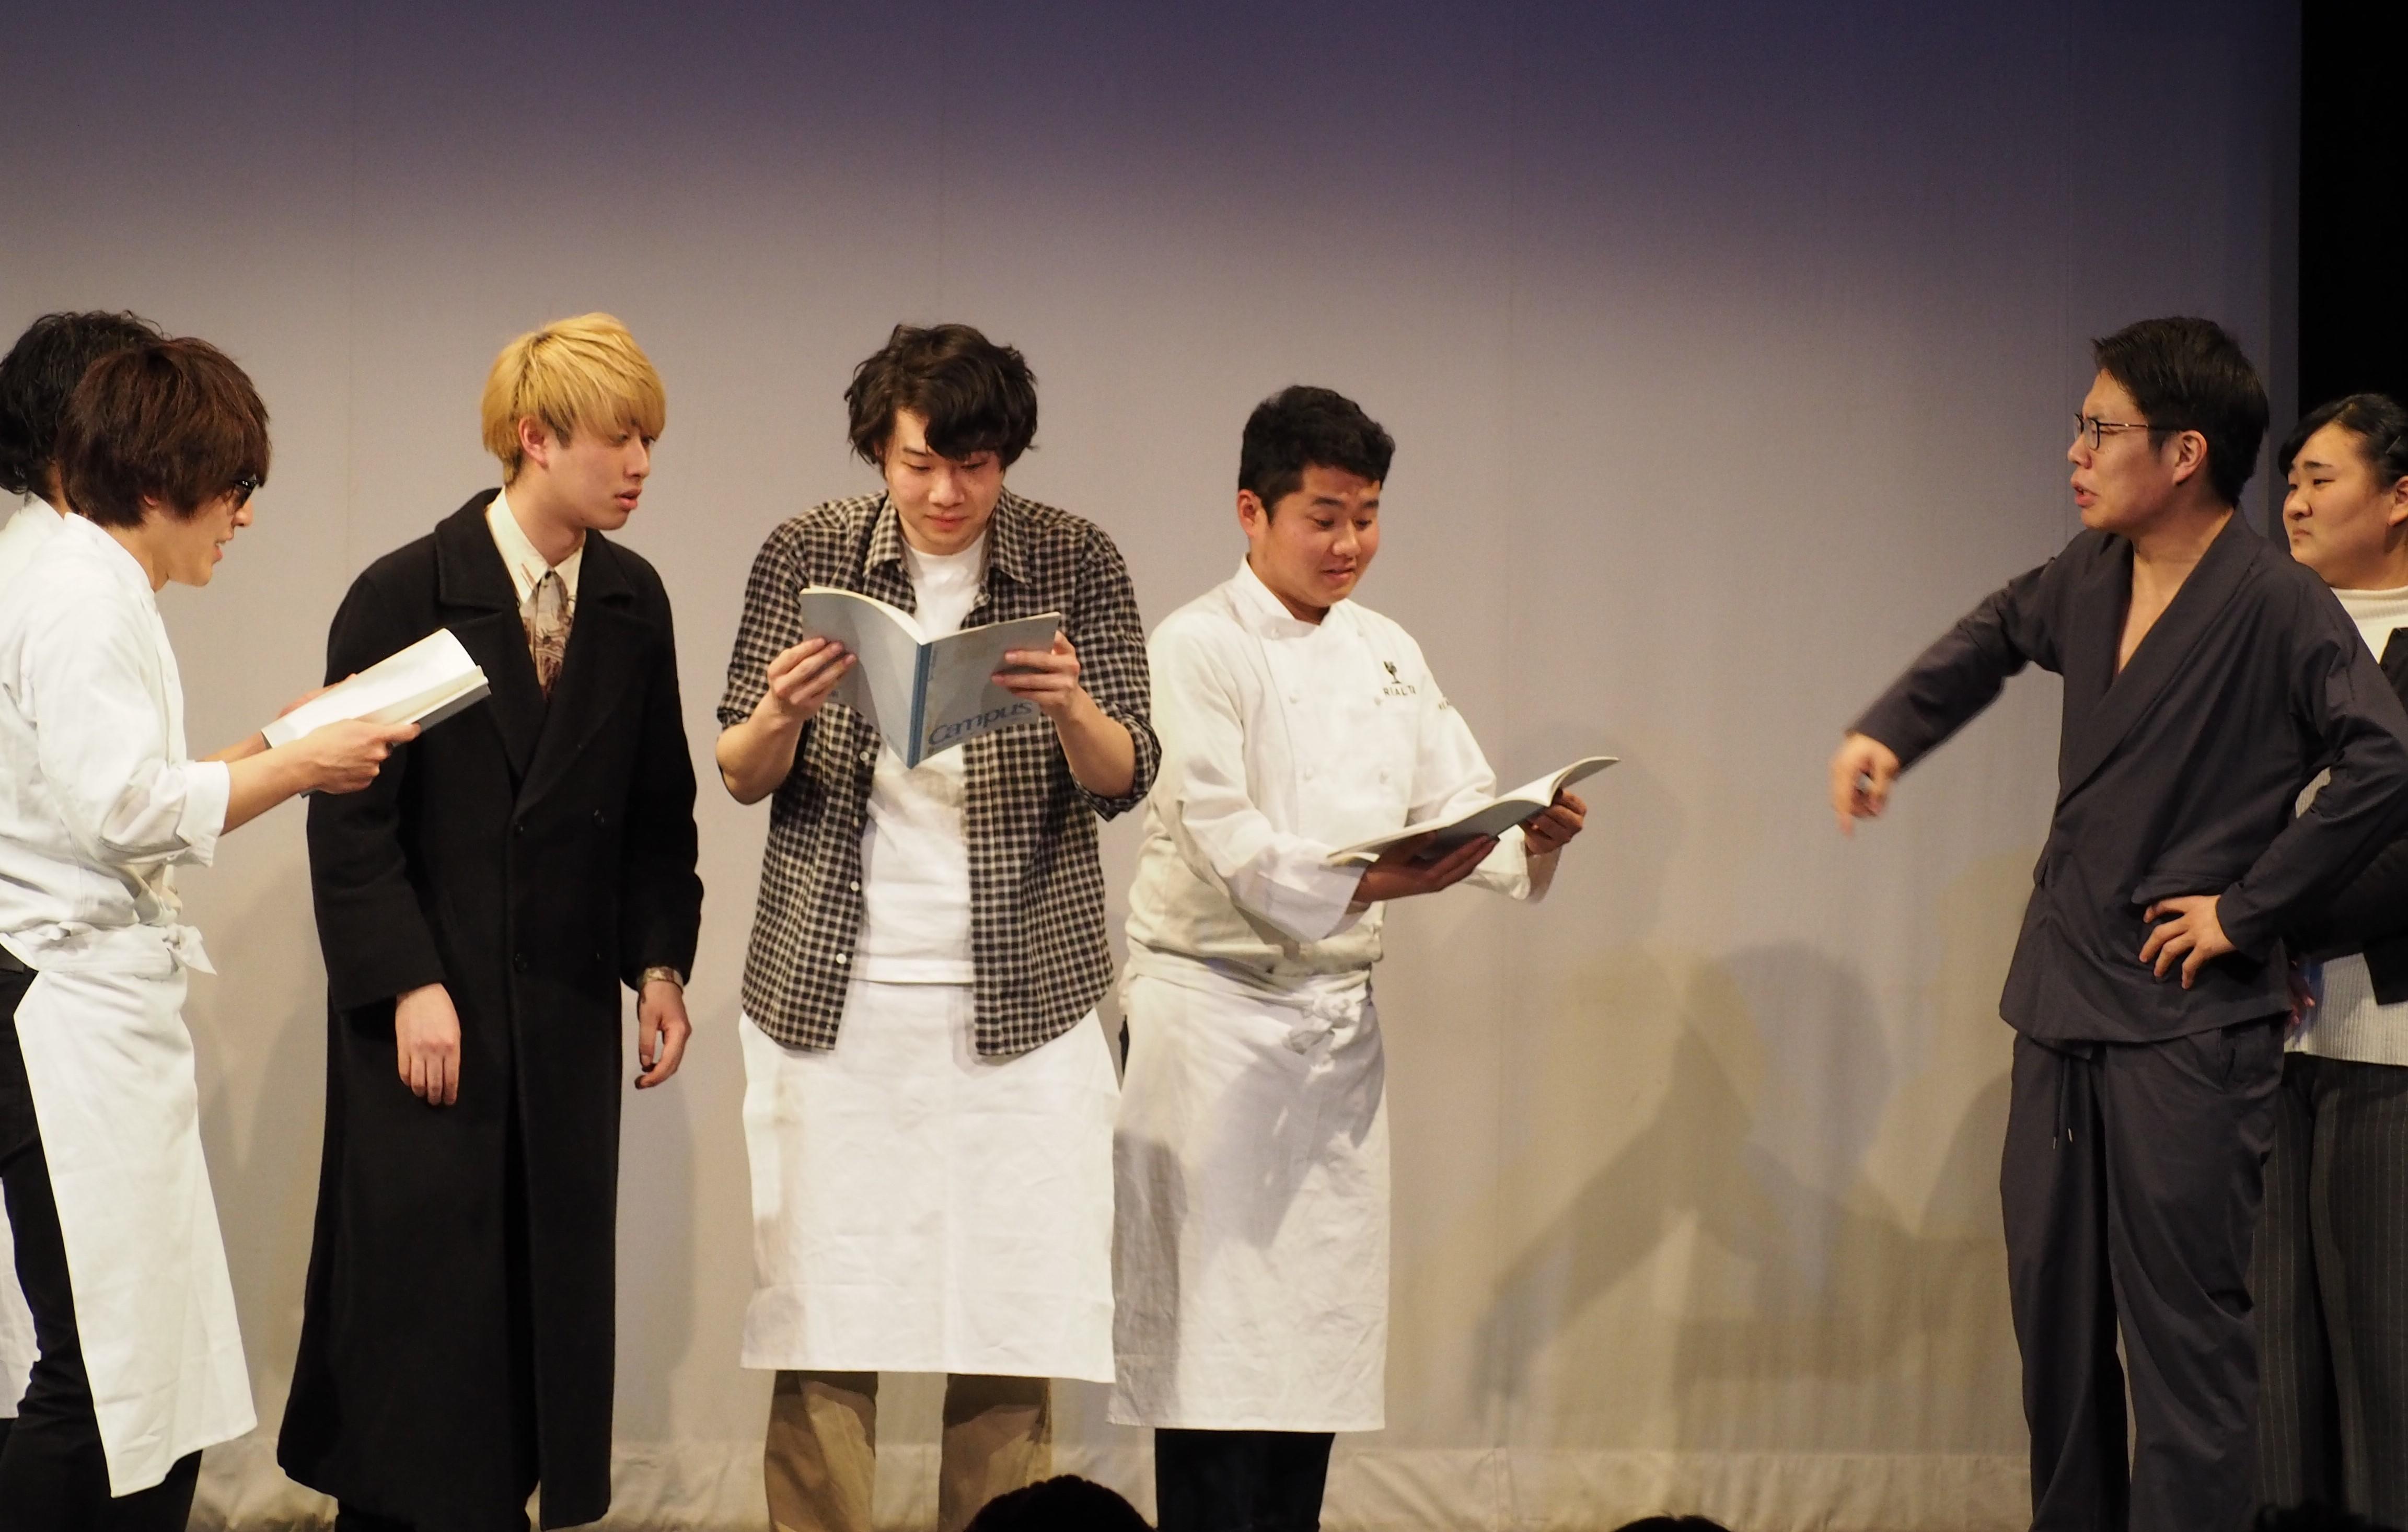 http://news.yoshimoto.co.jp/20180330201746-3897c0323cde8d9066624c7121d2fbaabeea52b3.jpg